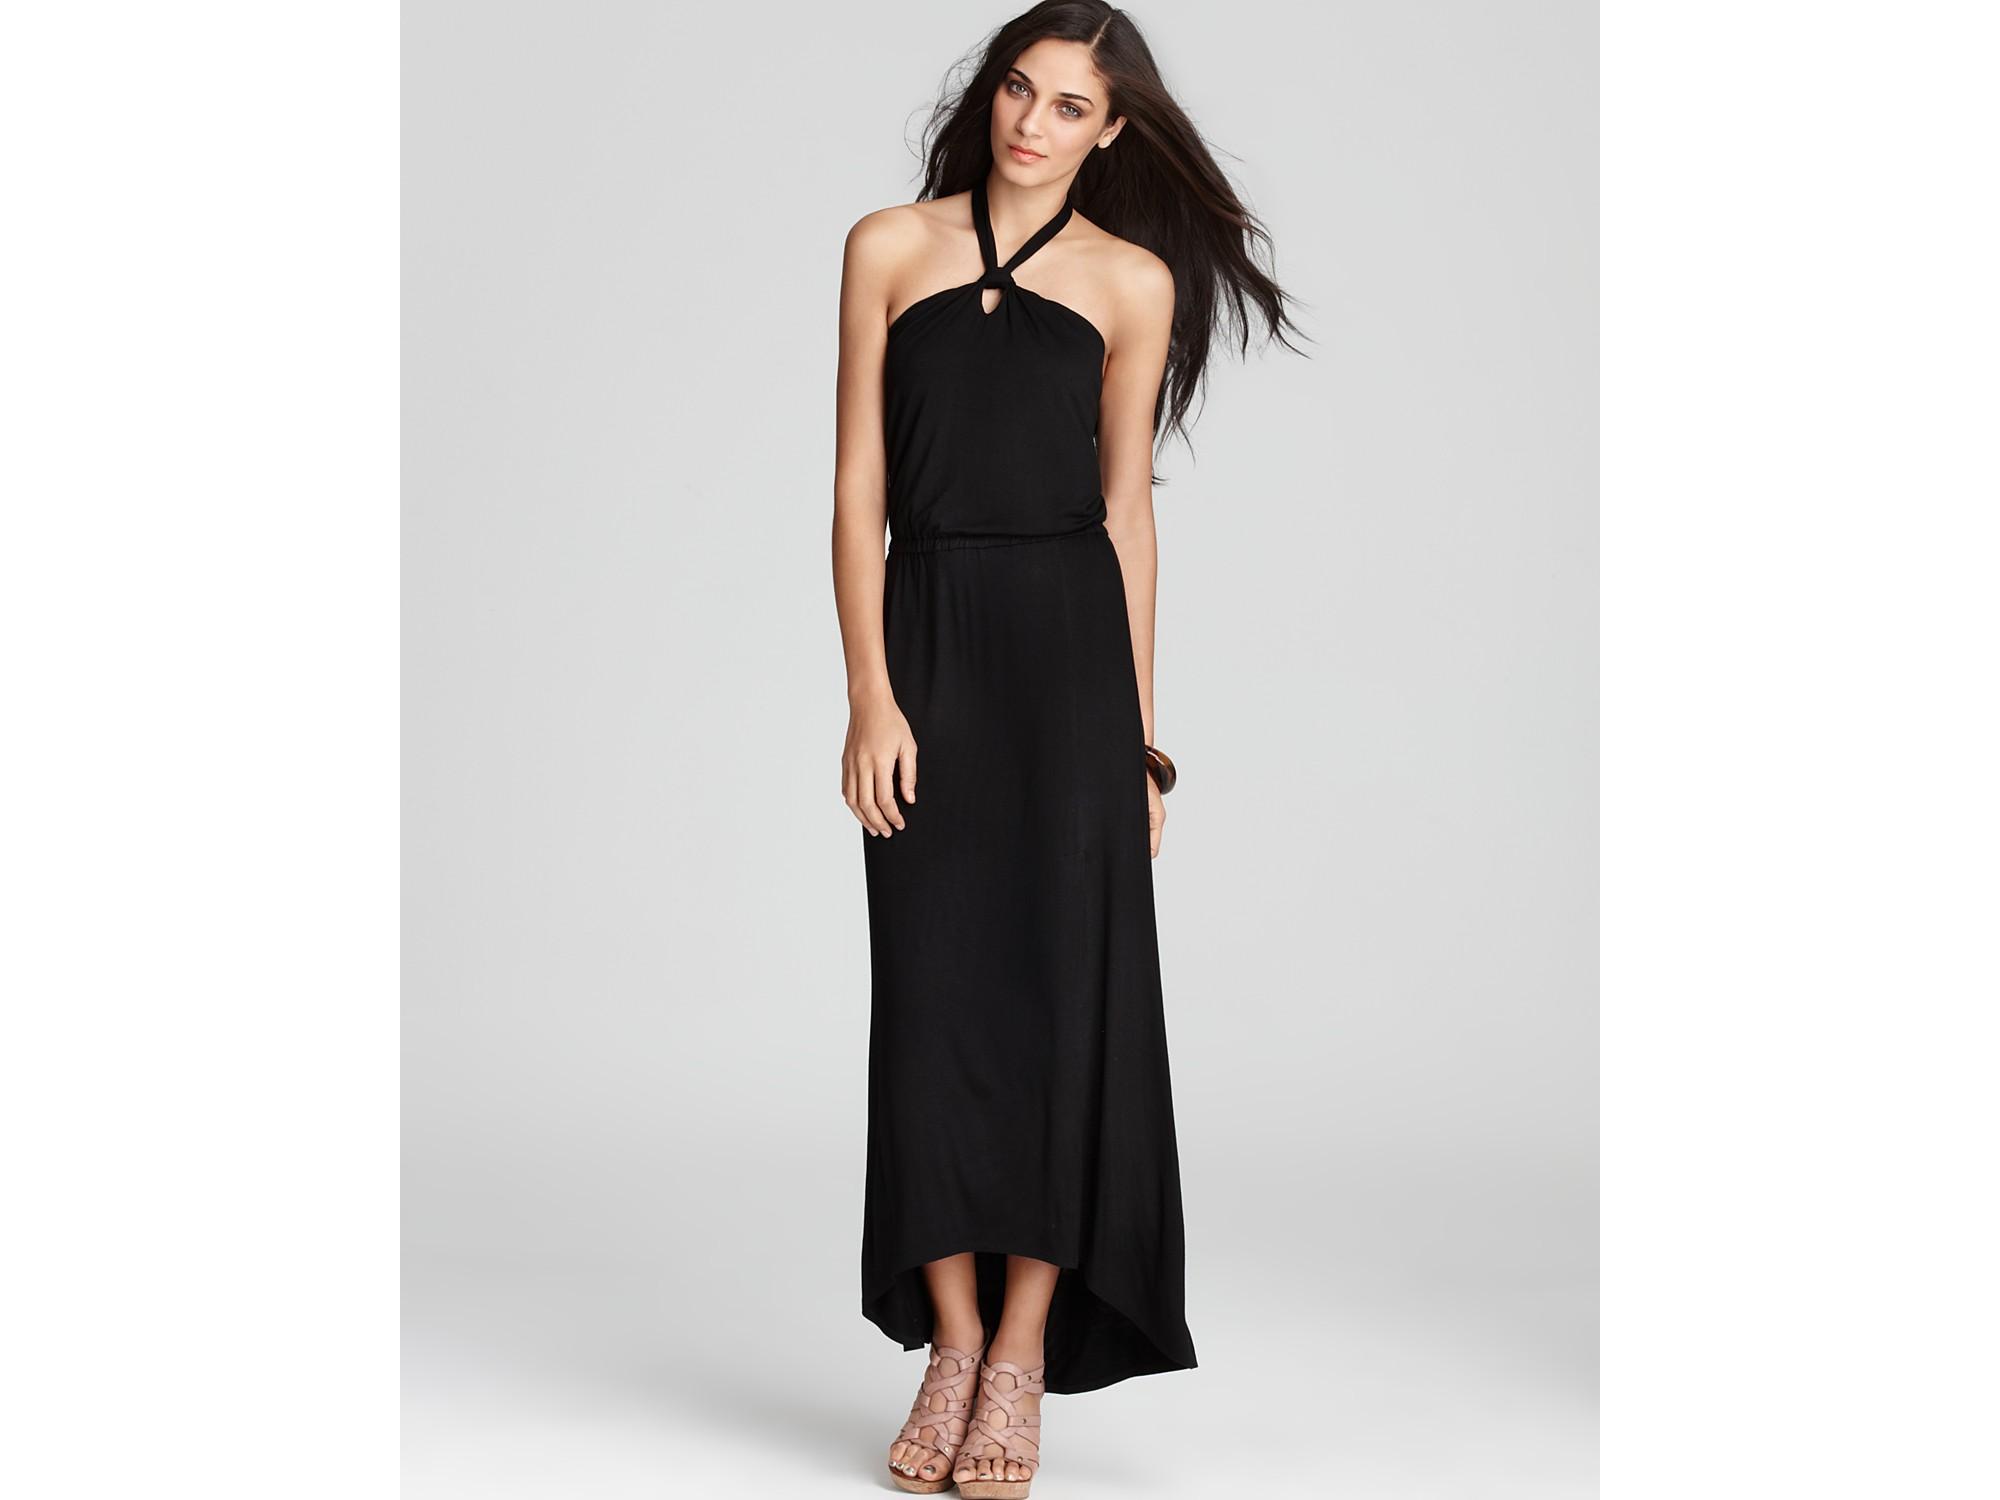 Ella moss girl best friend maxi dress